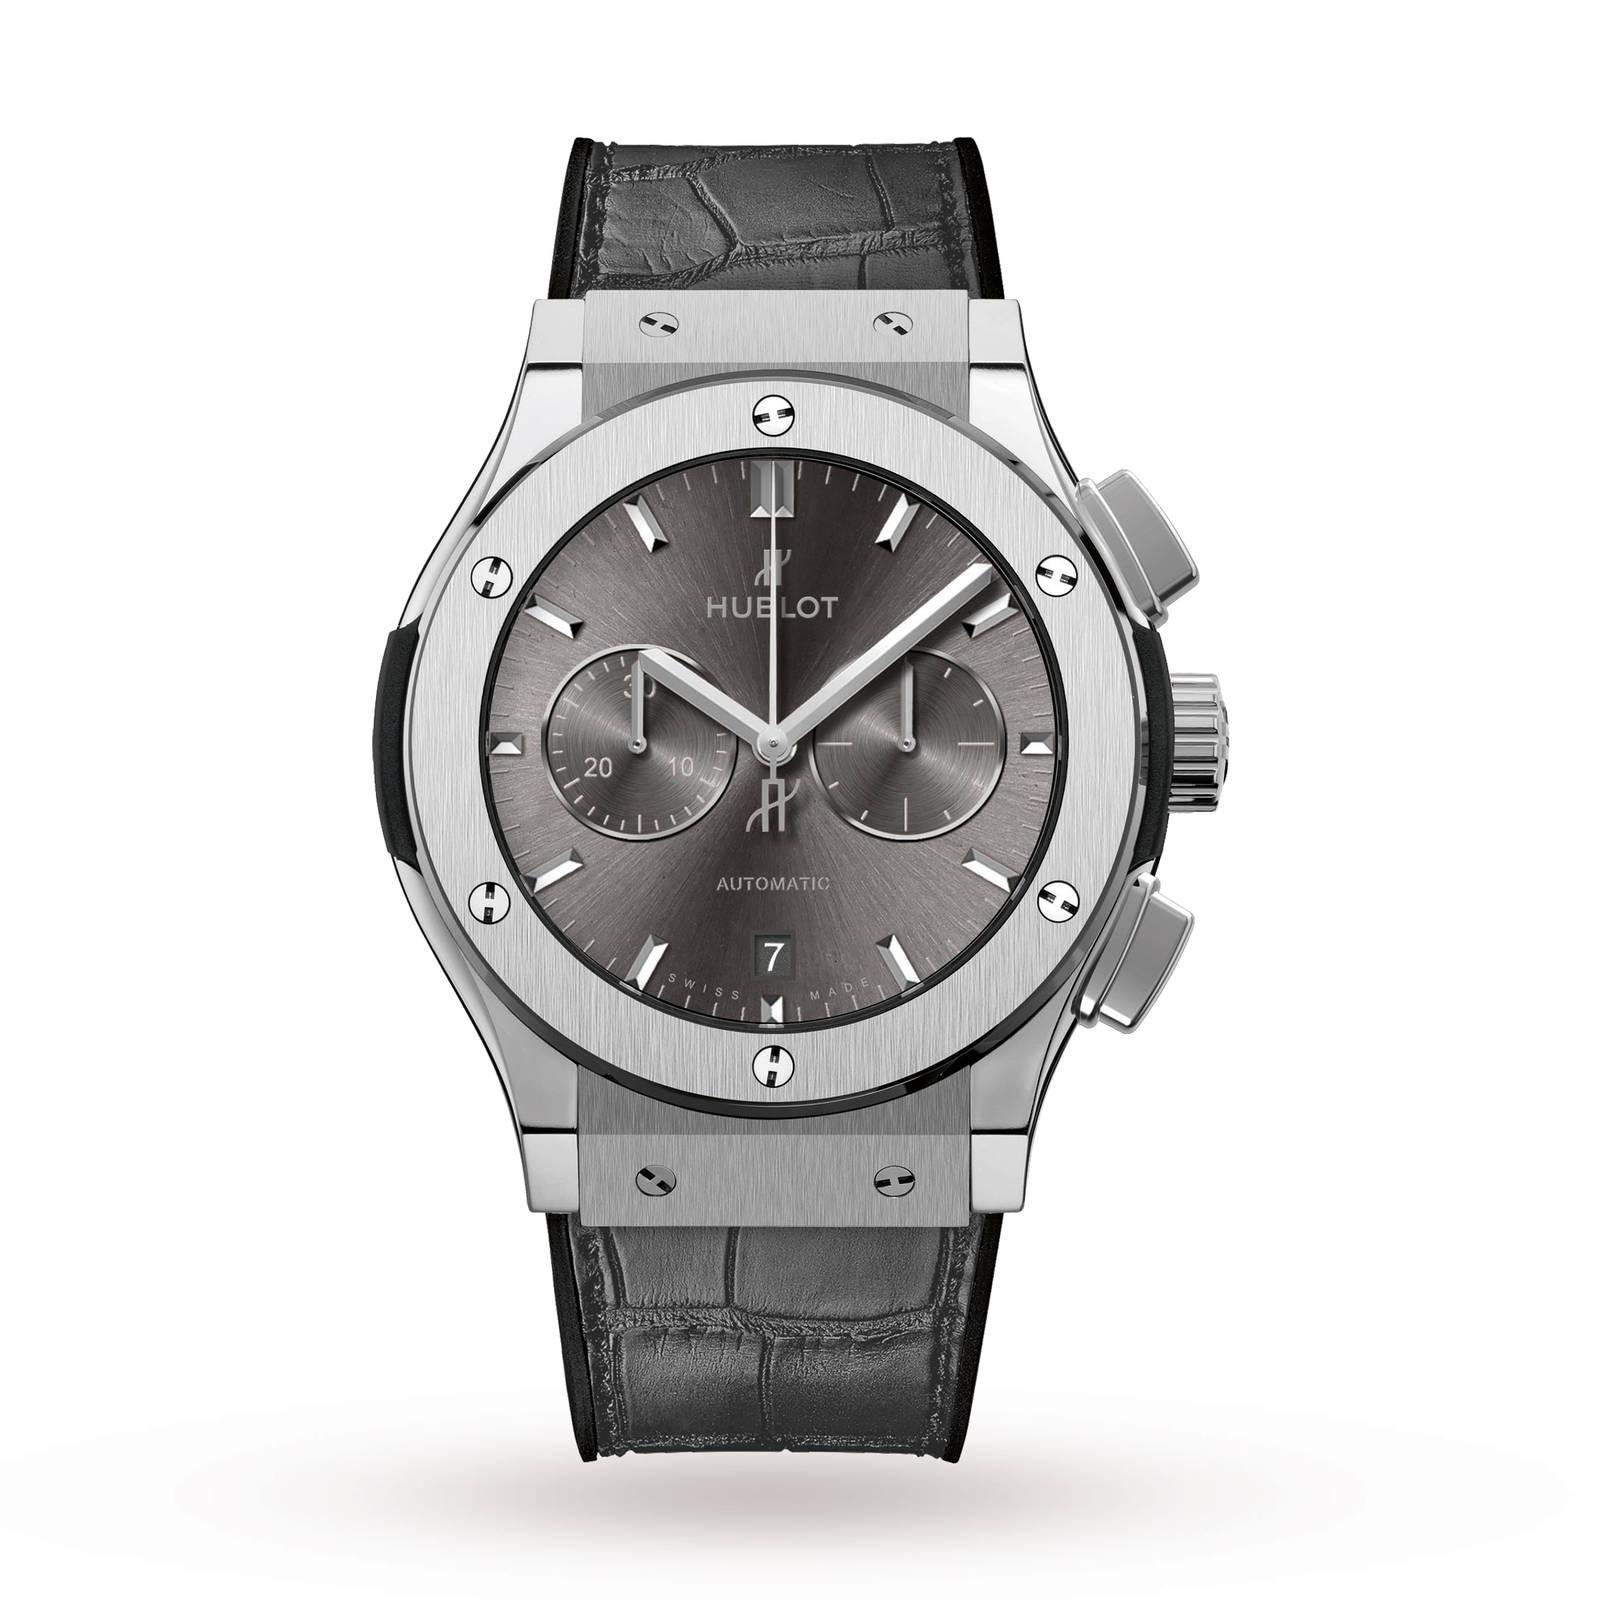 Hublot Hublot Classic Fusion Racing Grey Chronograph Titanium 42mm Mens Watch